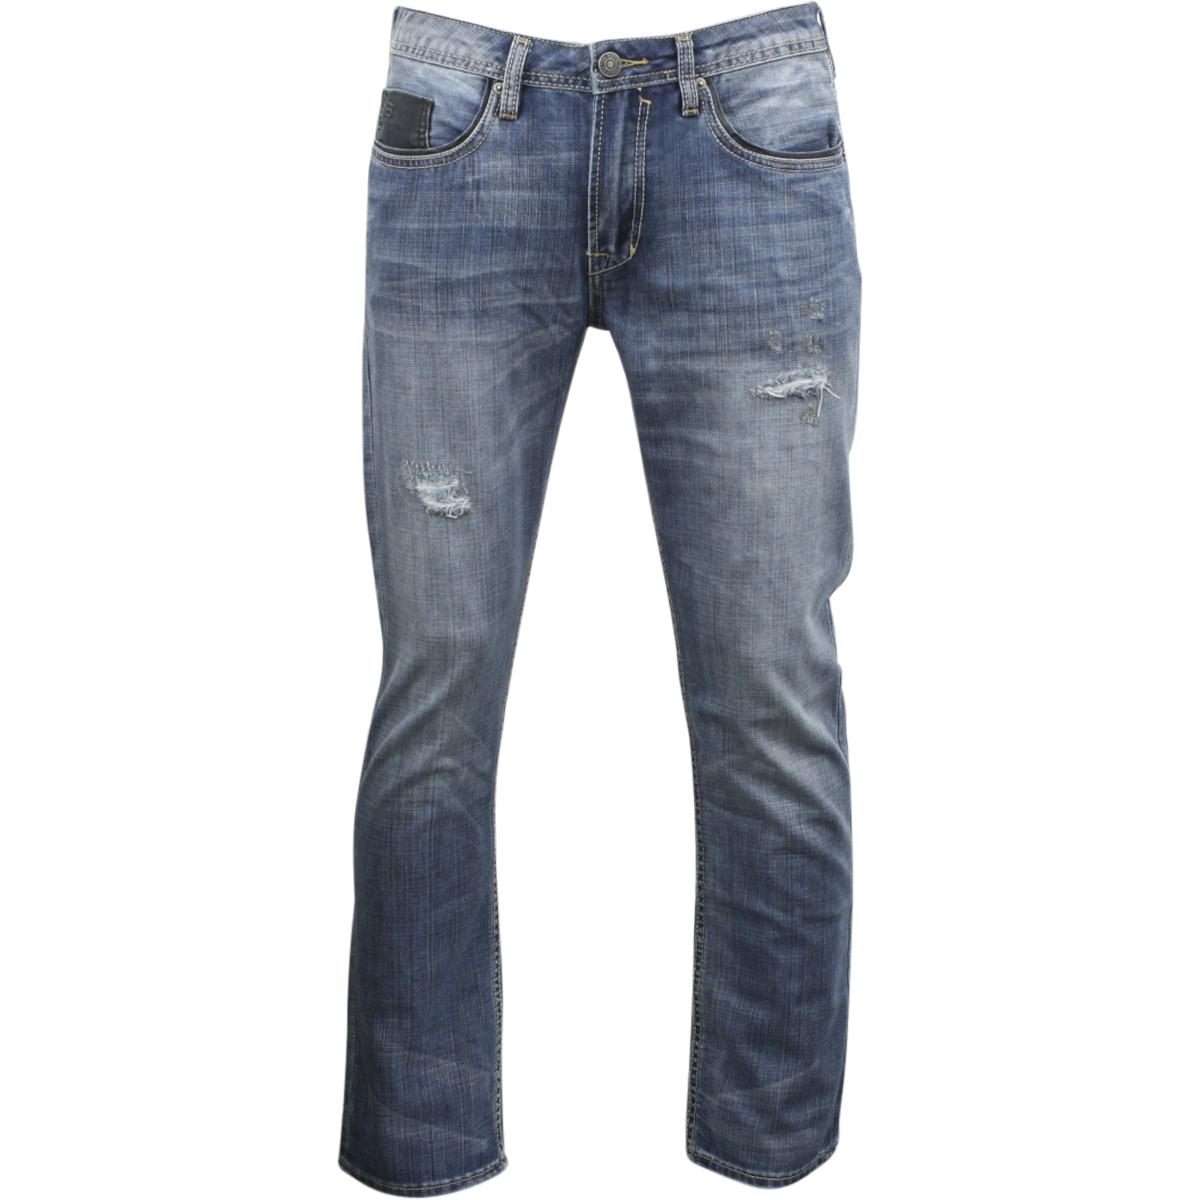 f2909d128094 Details about Buffalo By David Bitton Men's Evan Slim Fit Rip & Repair  Indigo Jeans